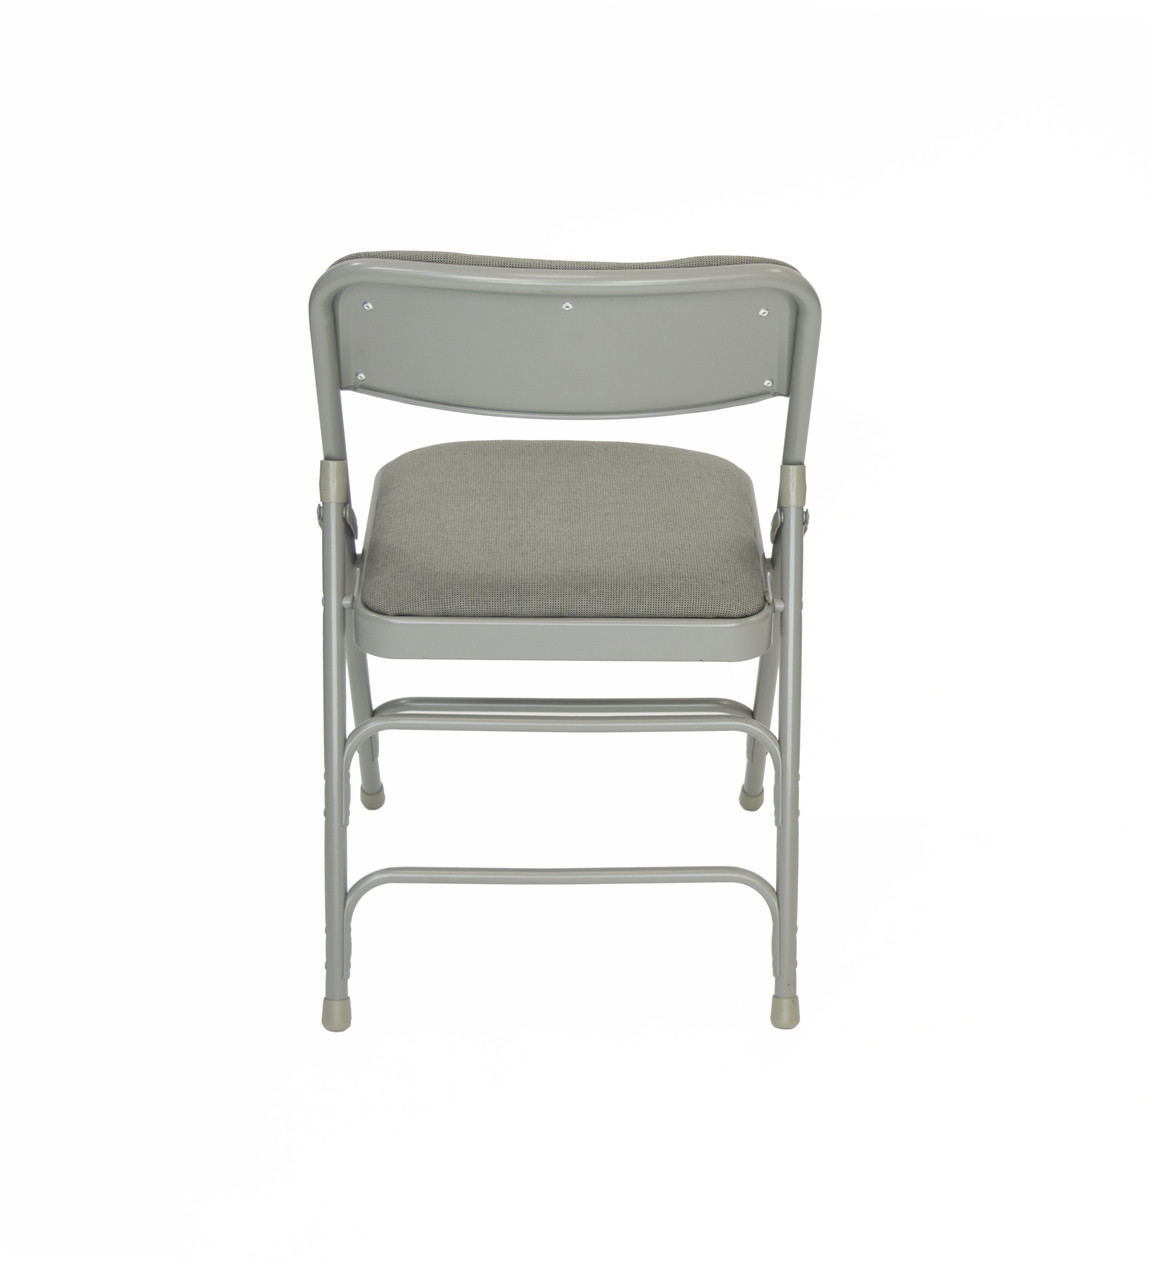 cloth padded folding chairs pink lawn chair rhino fabric quad hinged triple